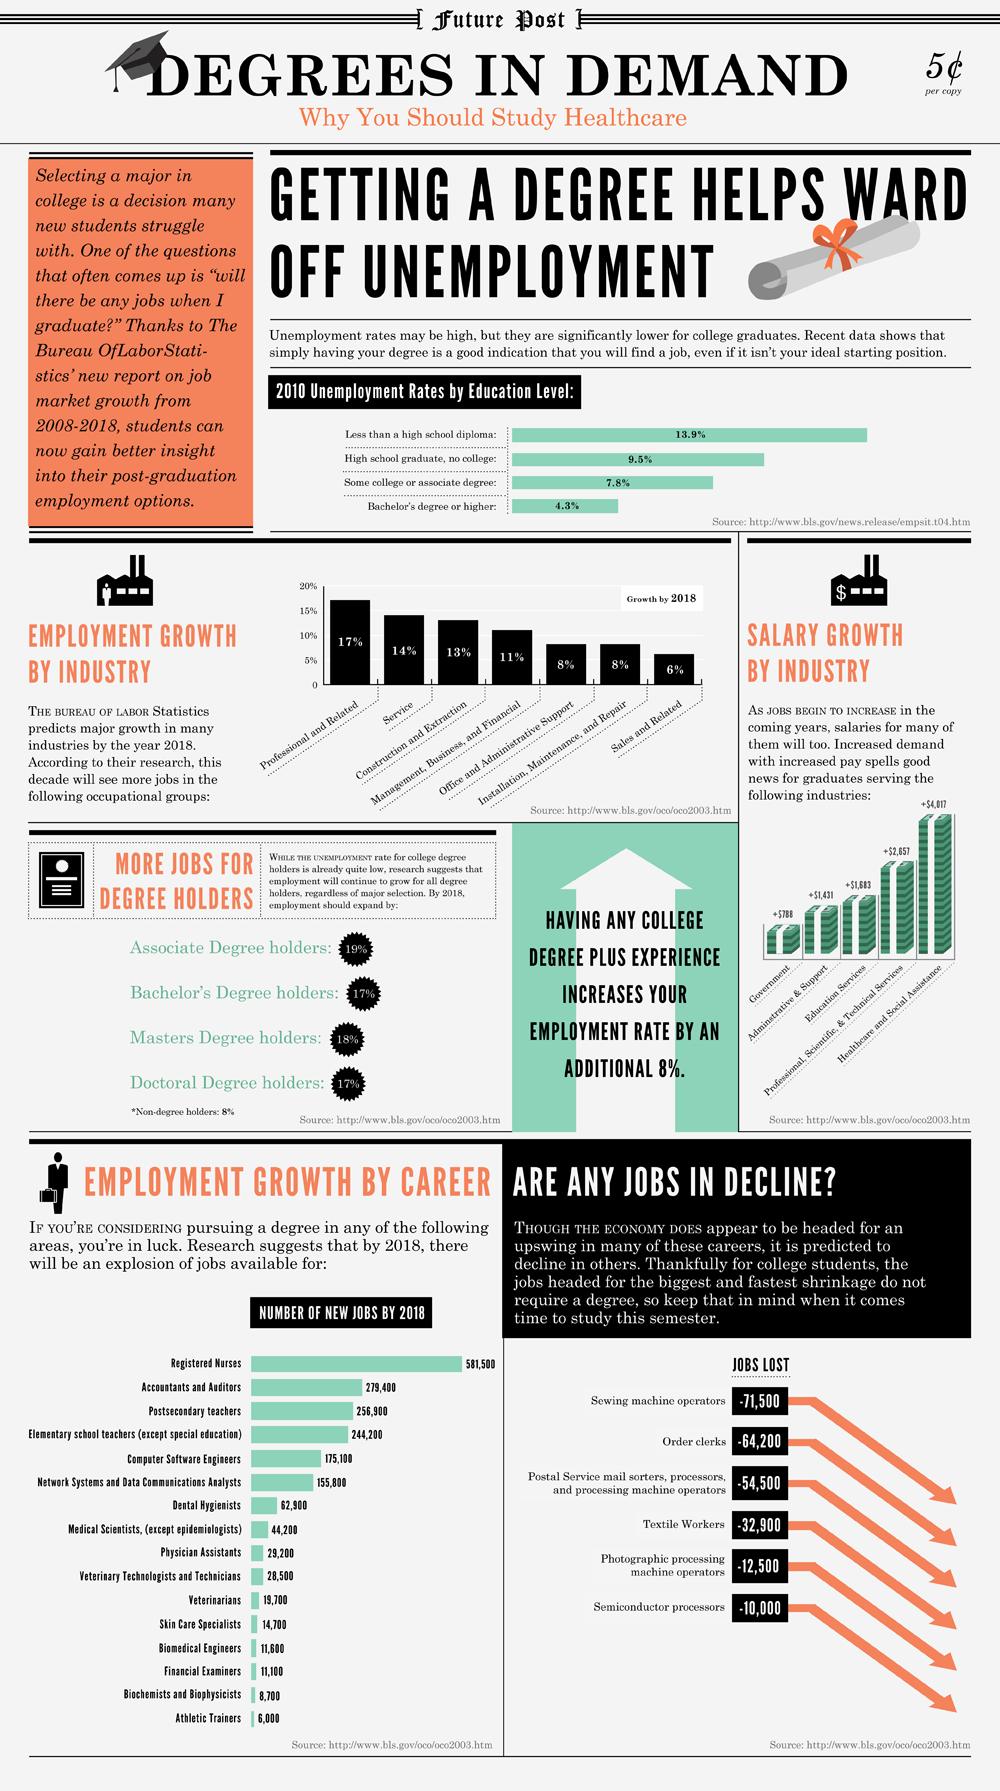 Degrees to Get a Job Job hunting tips, Career